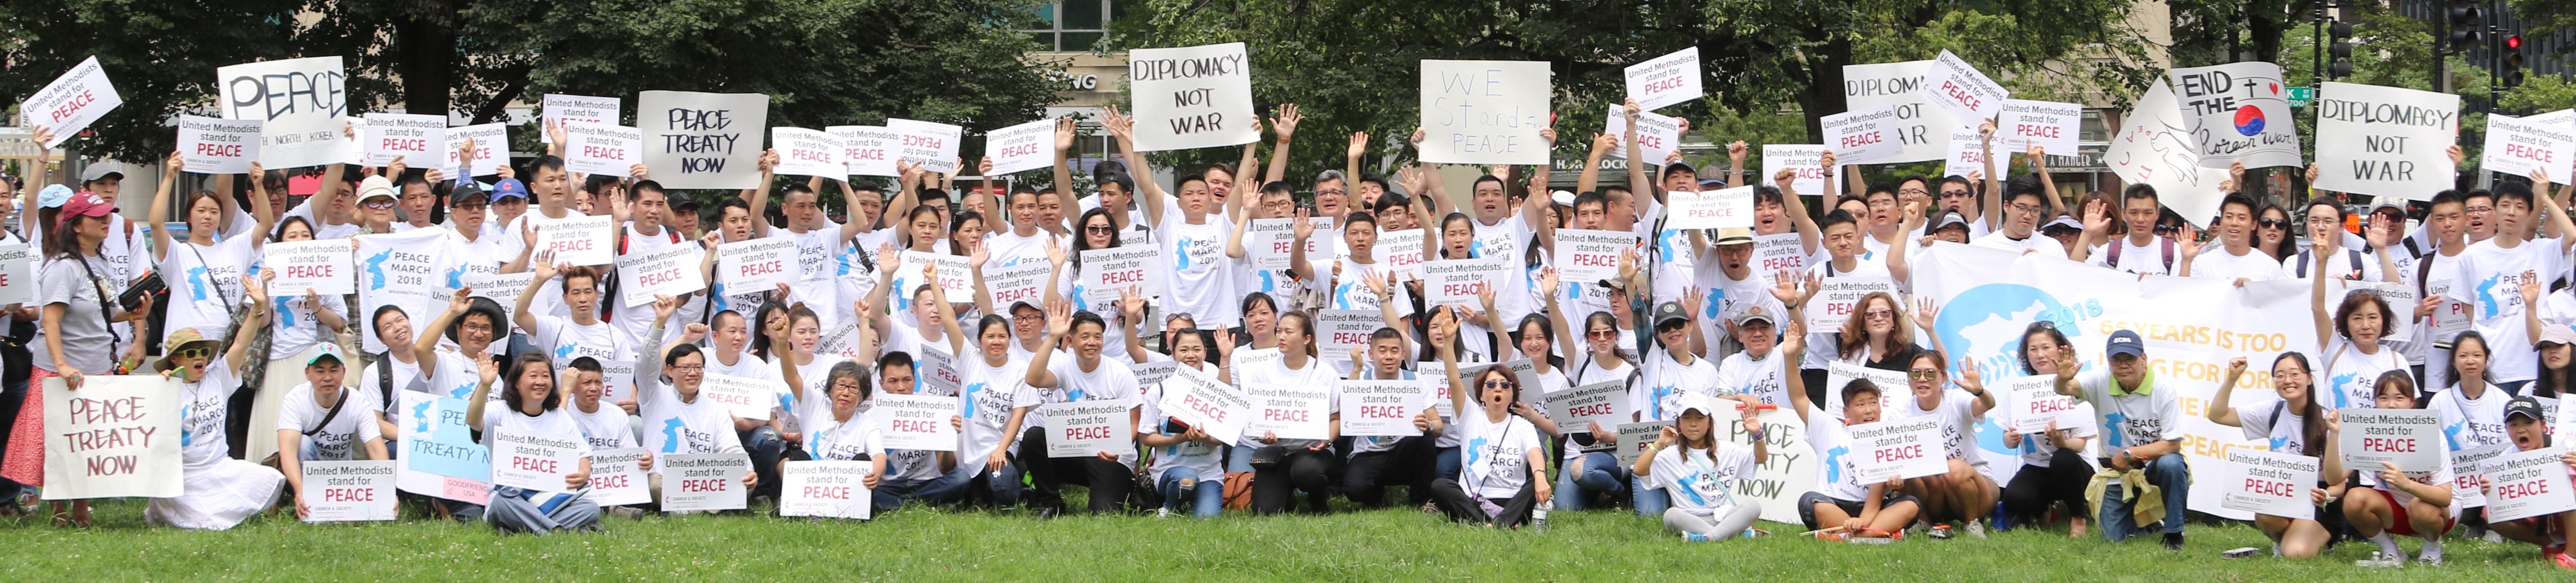 Korean Peace Festival and Vigil 2018 held at Foundry United Methodist Church , Washington DC. Photo by Thomas Kim, UMNS